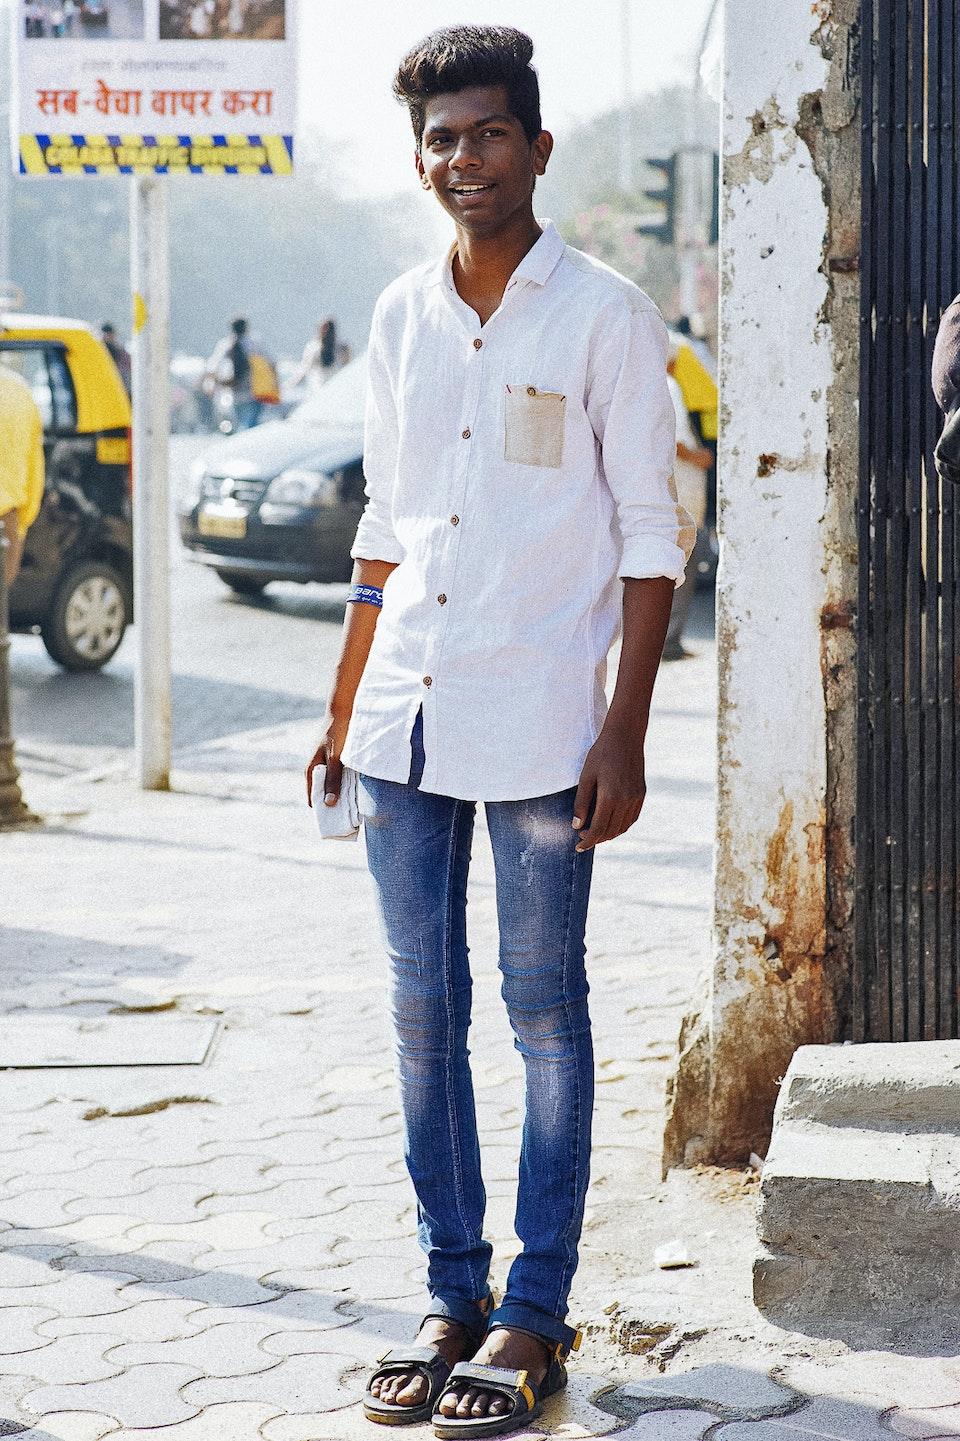 Levi's Portraits of India. _F7T7170a